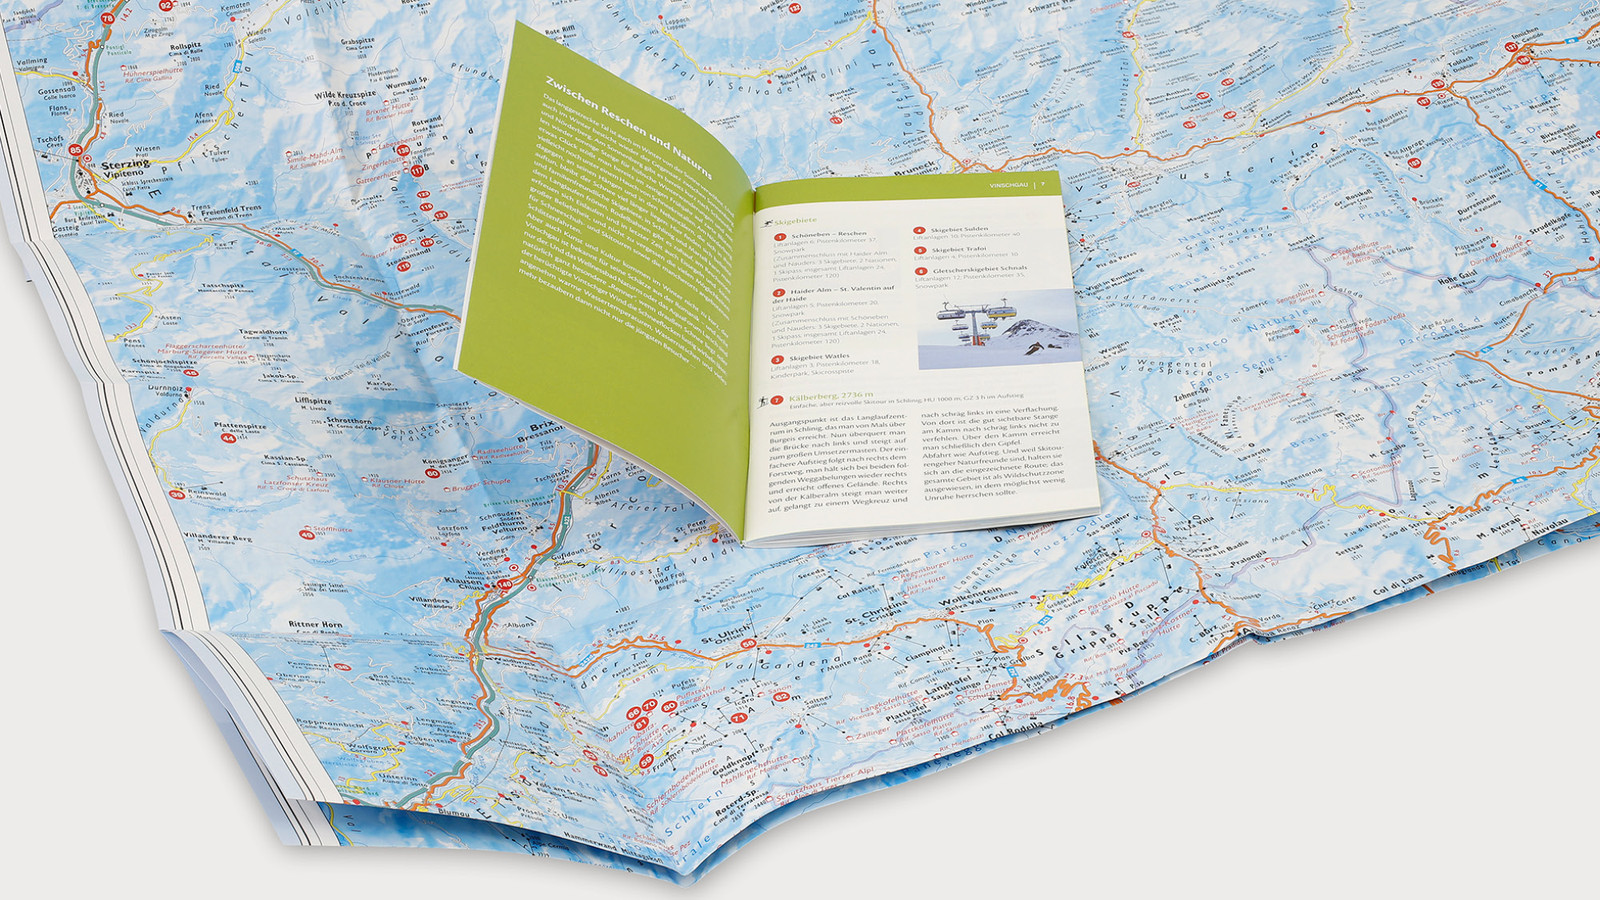 Winter-Freizeitkarte - Athesia-Tappeiner Verlag